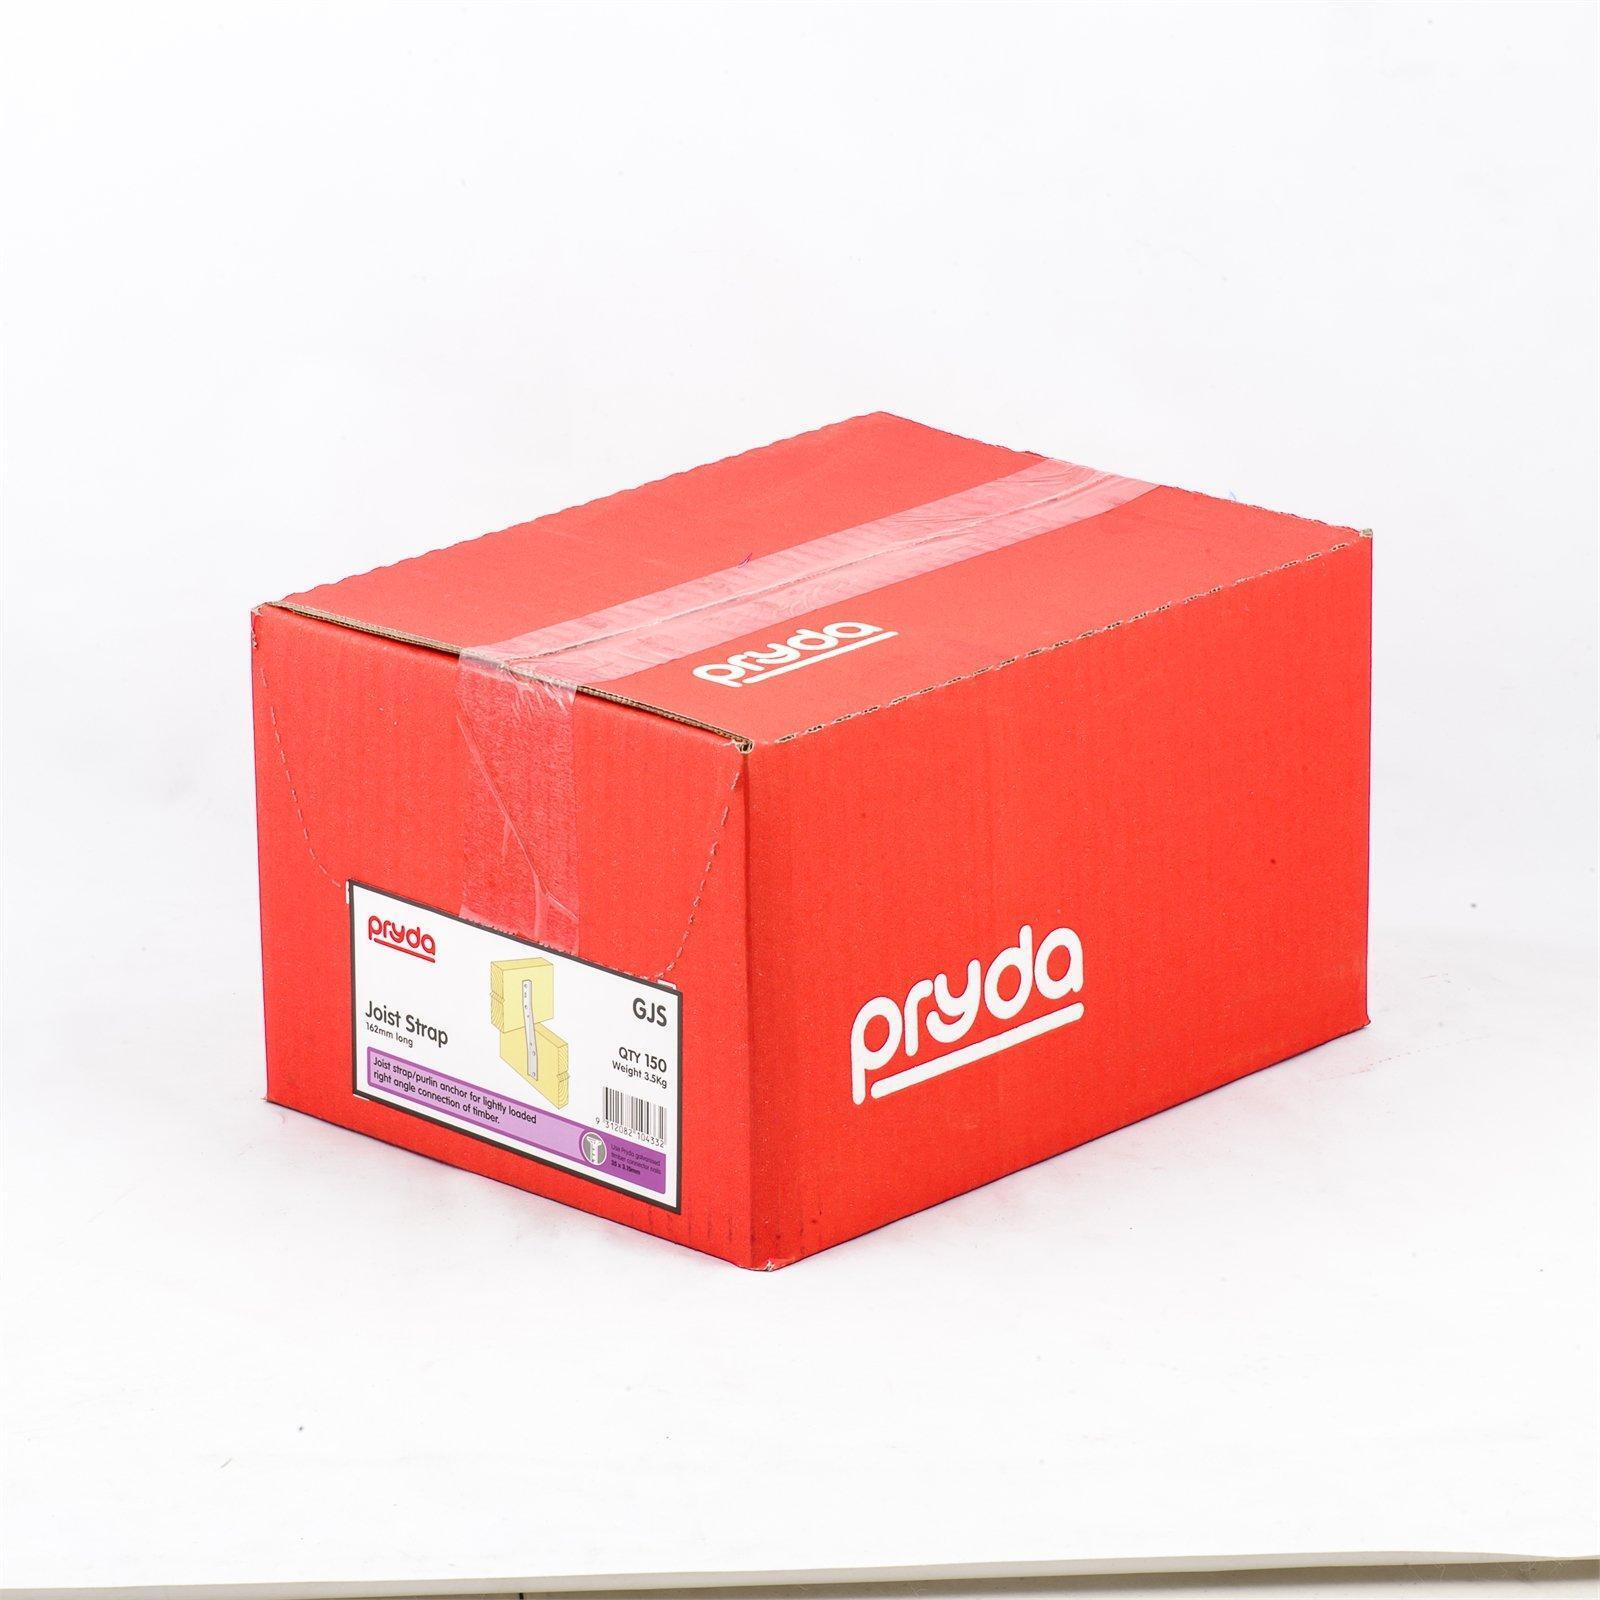 Pryda Joist Strap 162mm Box 150